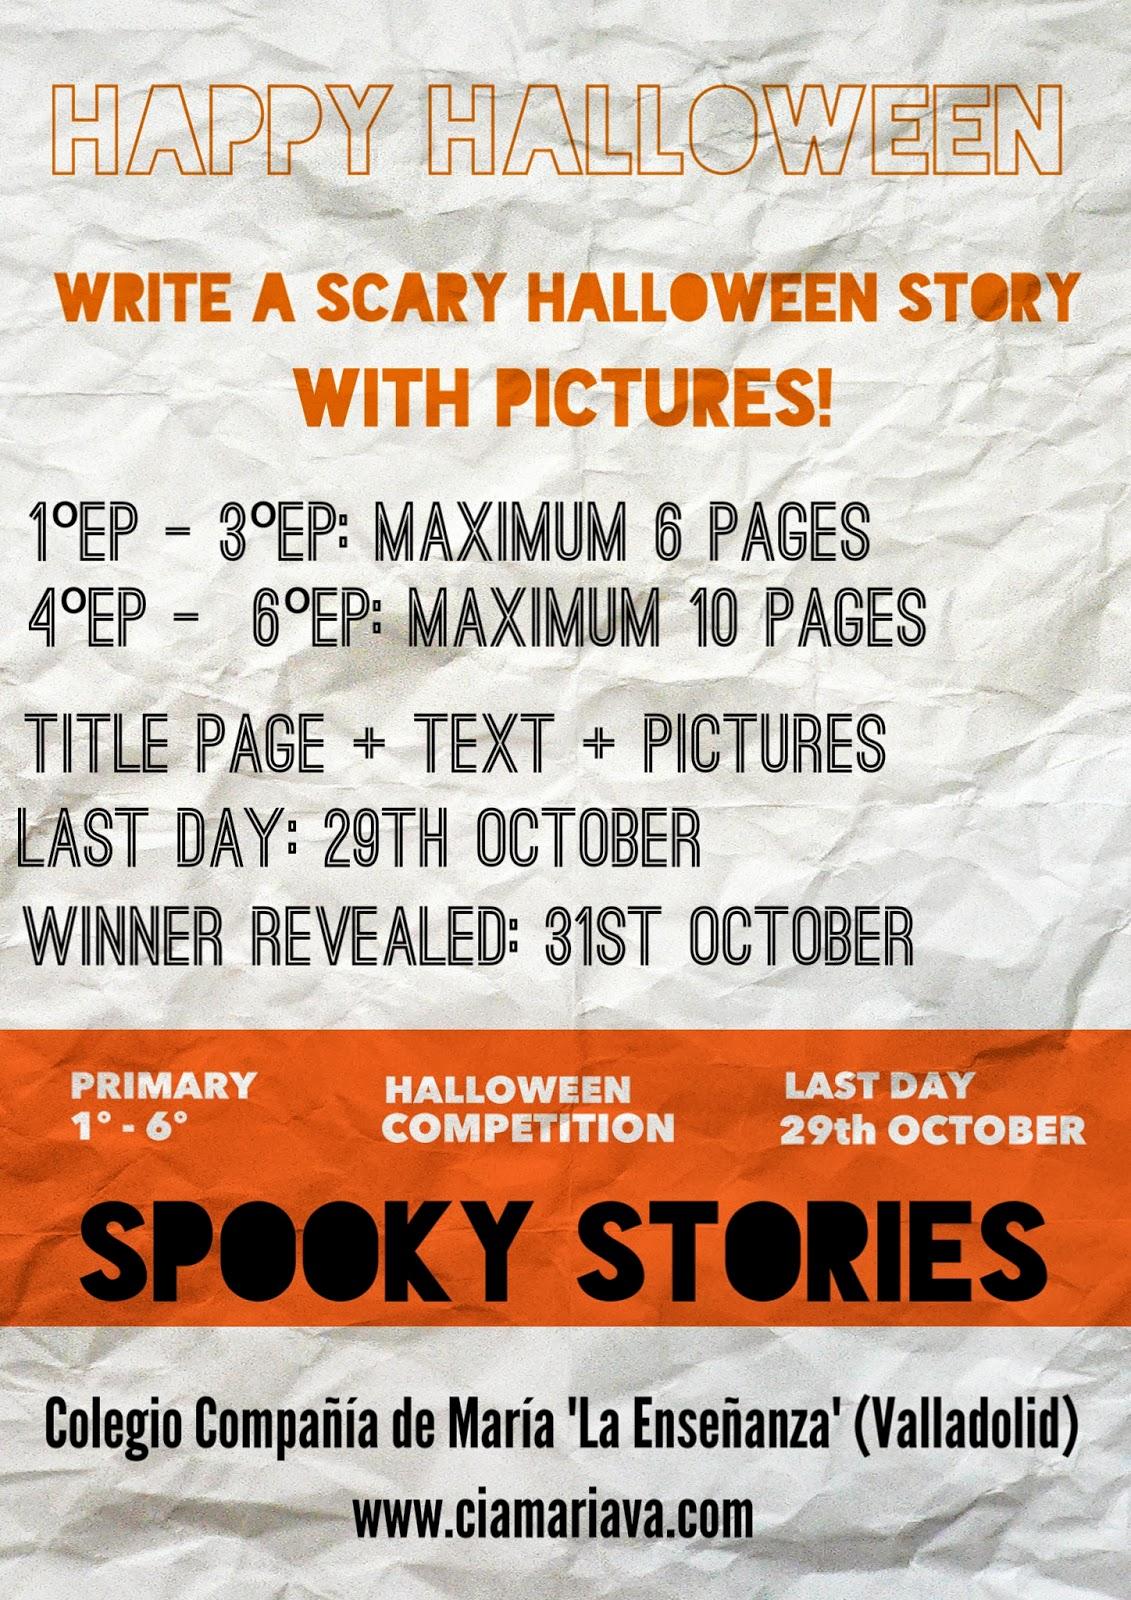 a scary halloween story halloween festival blackstone franklin  hi second grade ordm ep vocabulario para los alumnos de 2ordm ep best ideas about halloween stories